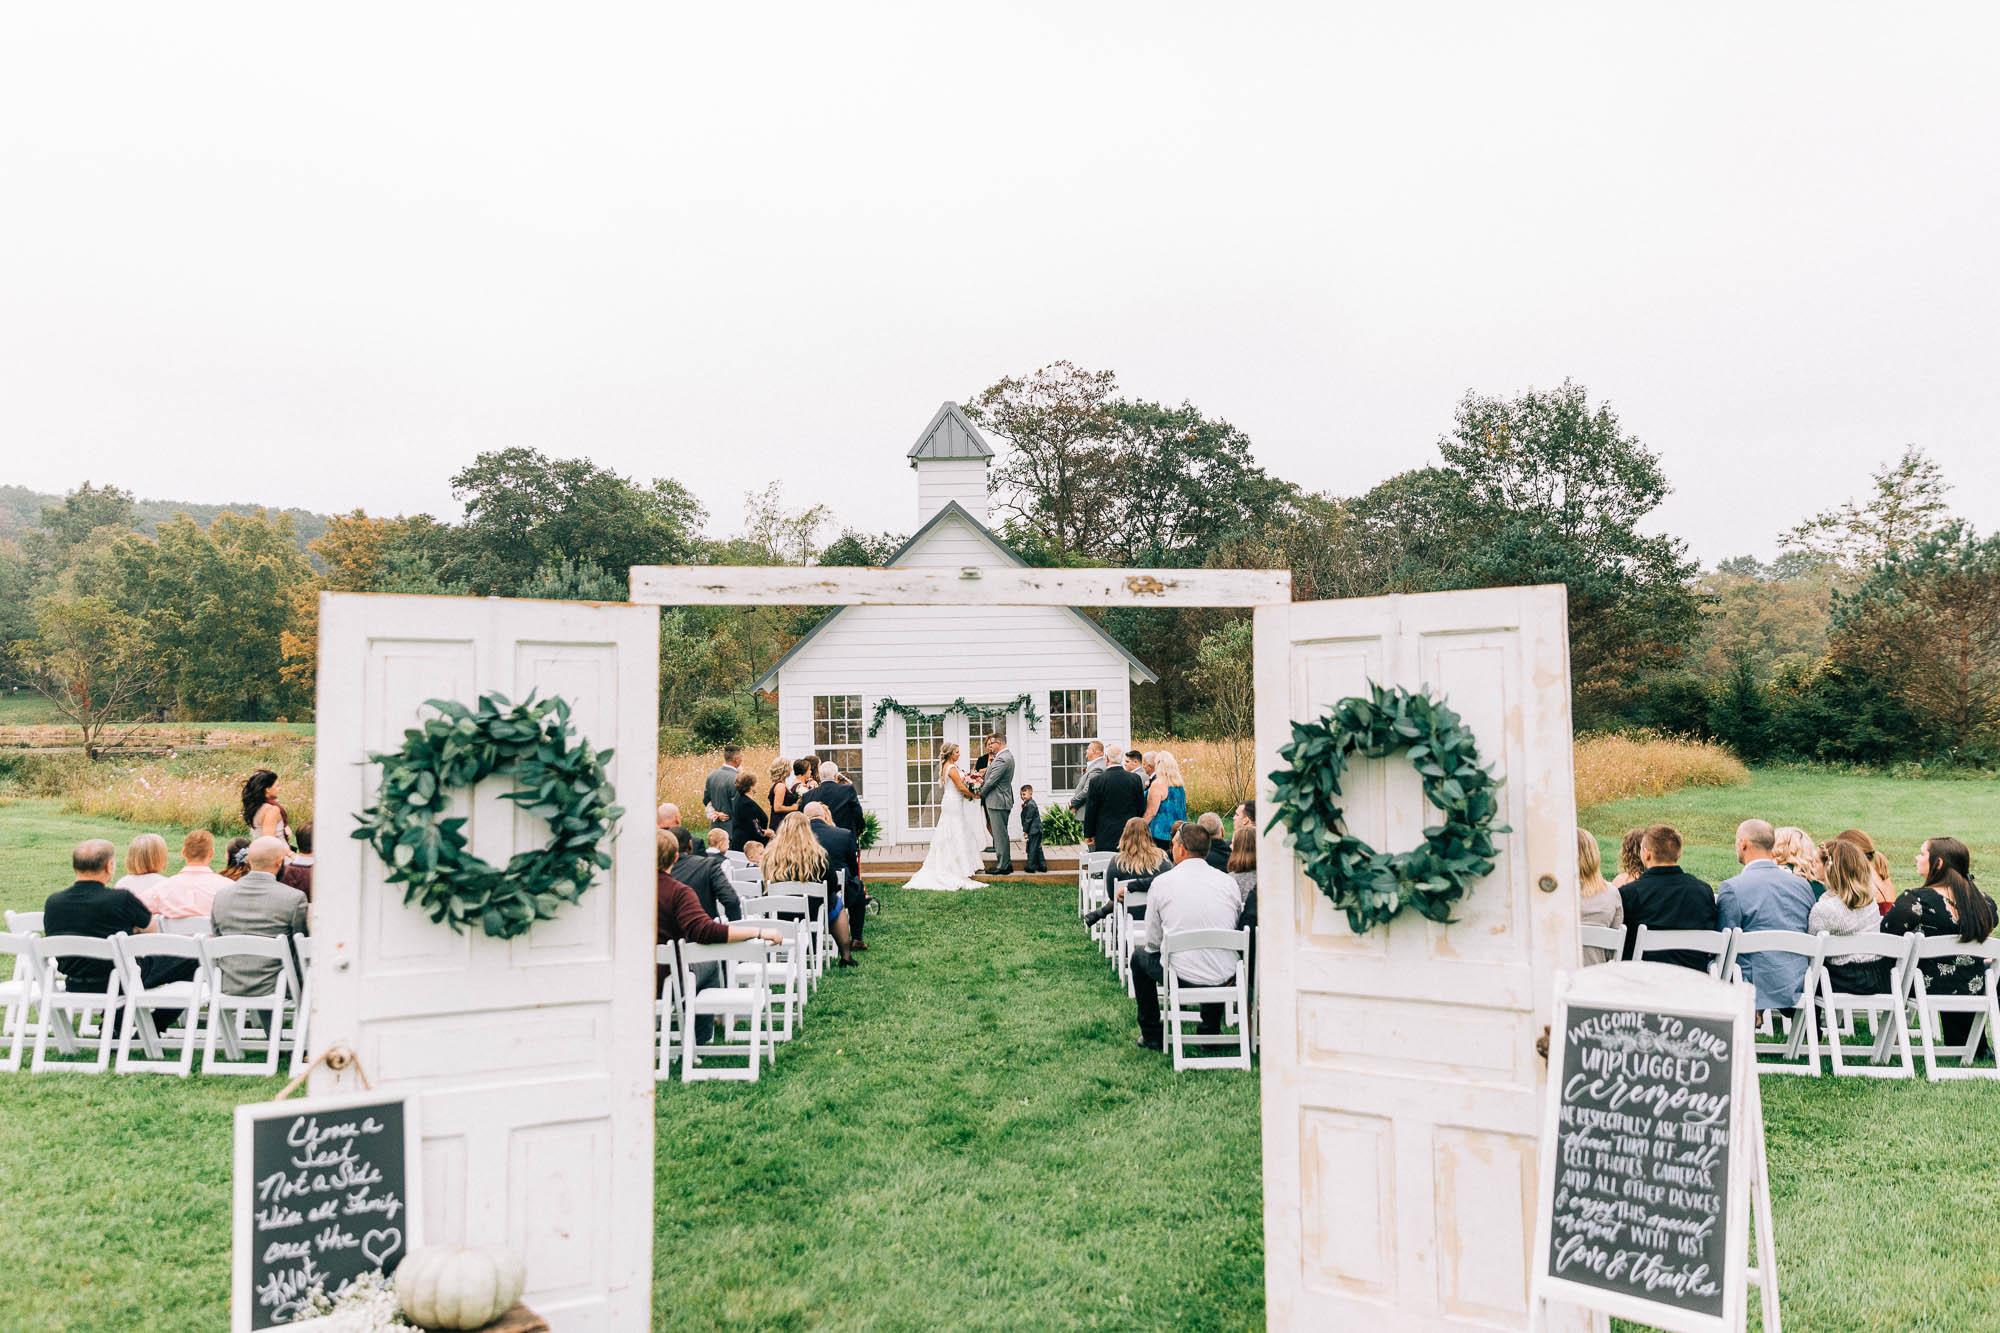 Lodge-at-Raven-Creek-October-wedding-24.jpg